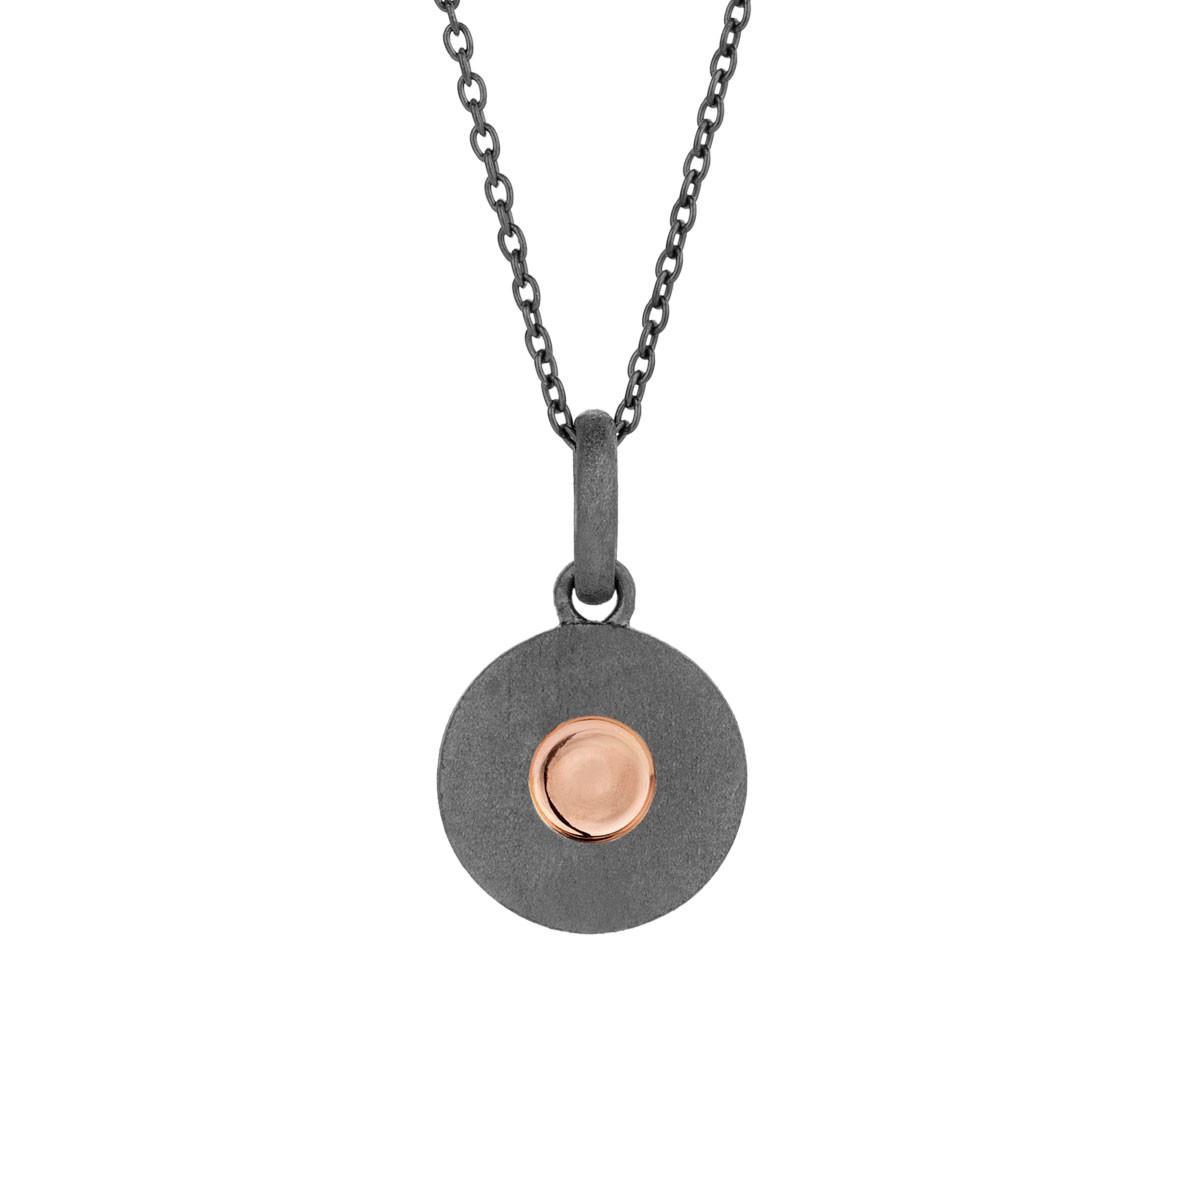 Raw Sølv Halskæde fra Spirit Icons S10314-45